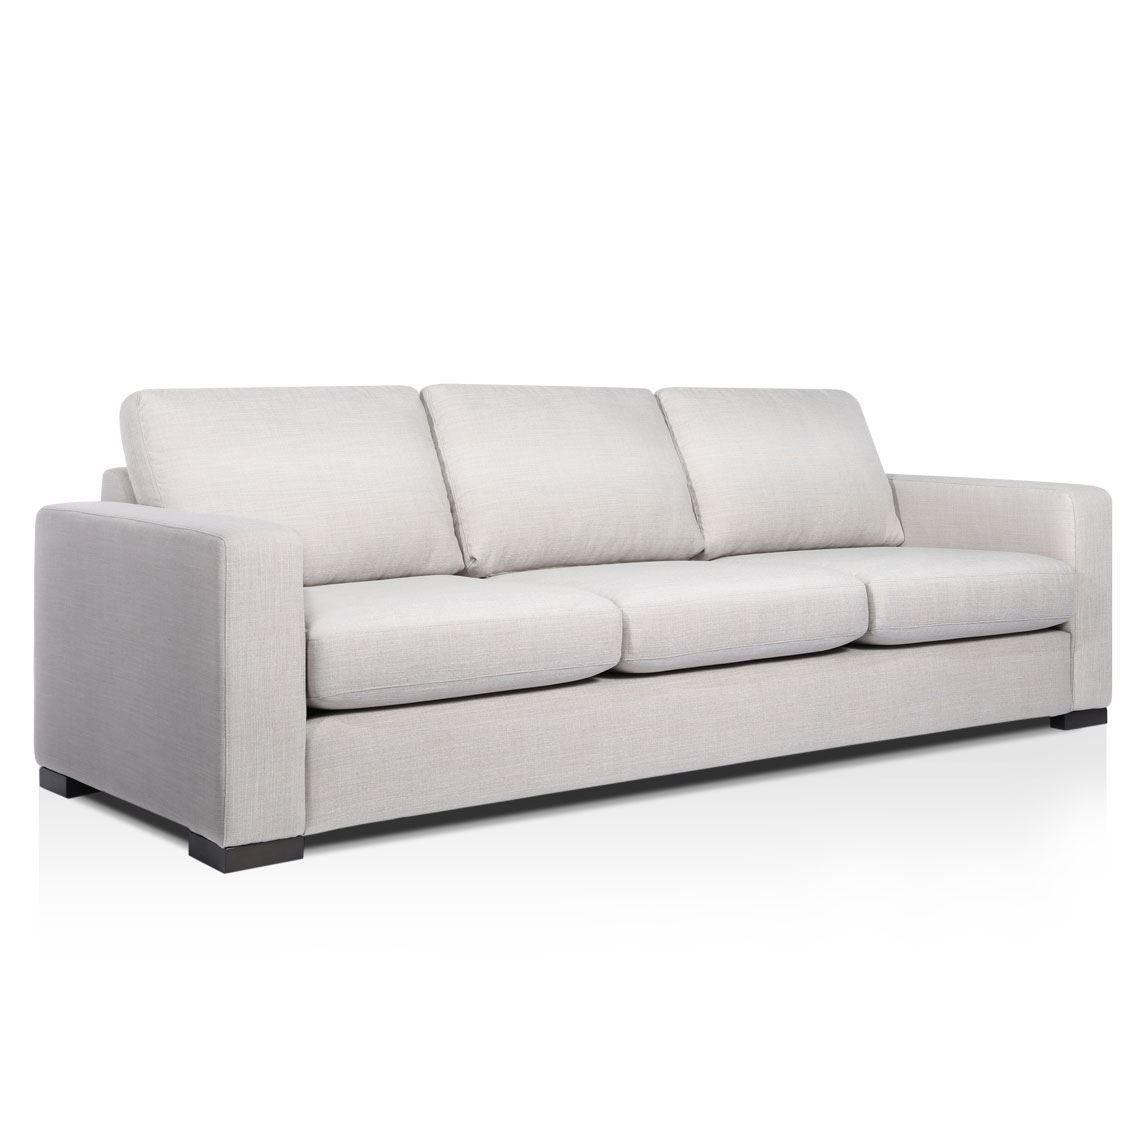 Signature Contemporary 3 Seat Fabric Sofa Standard Sofa Fabric